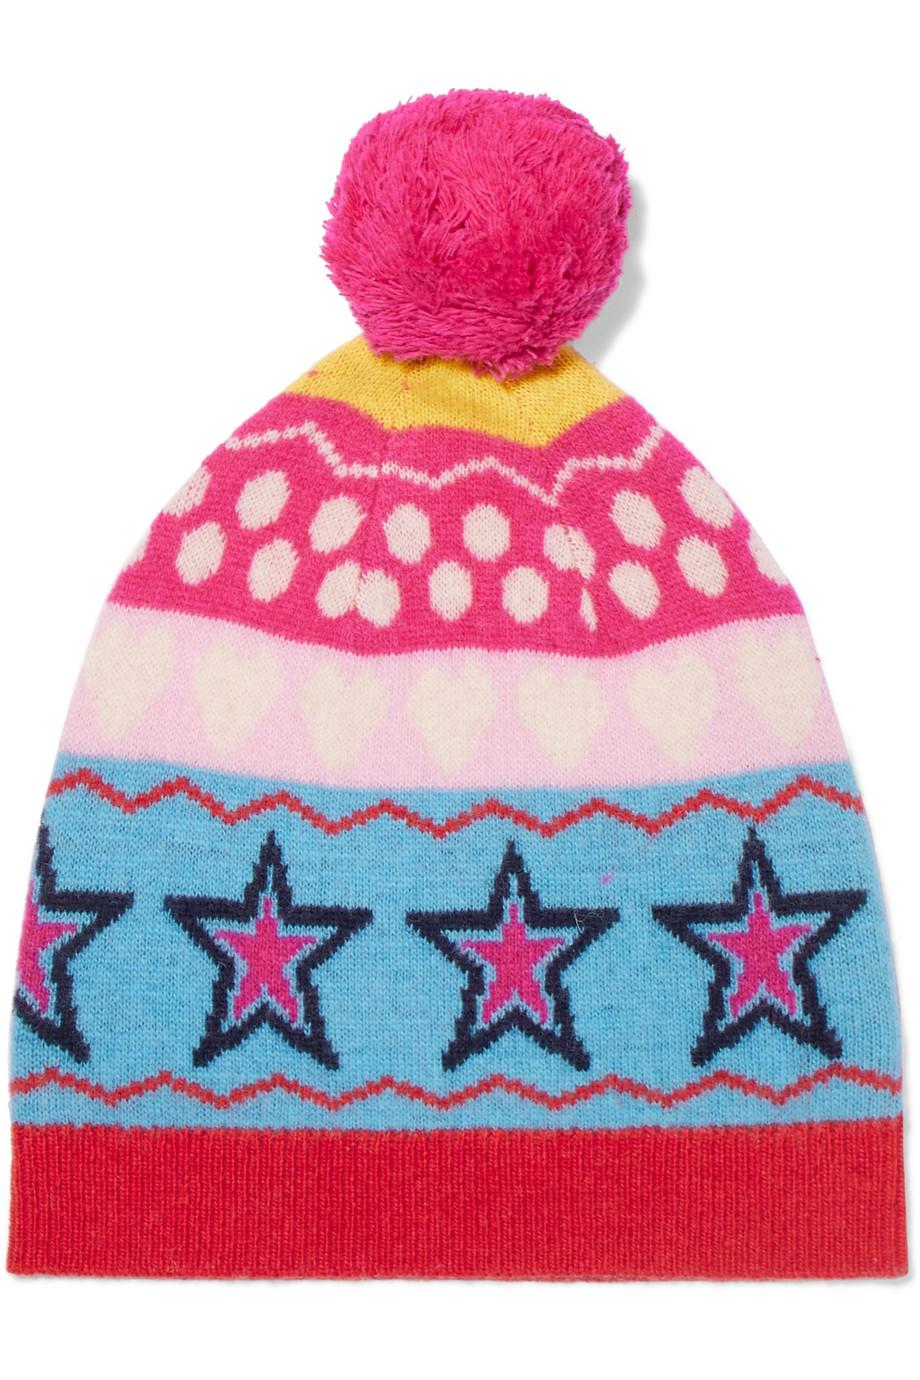 Ski Party Wool-jacquard Beanie - Pink Chinti and Parker WKKK9